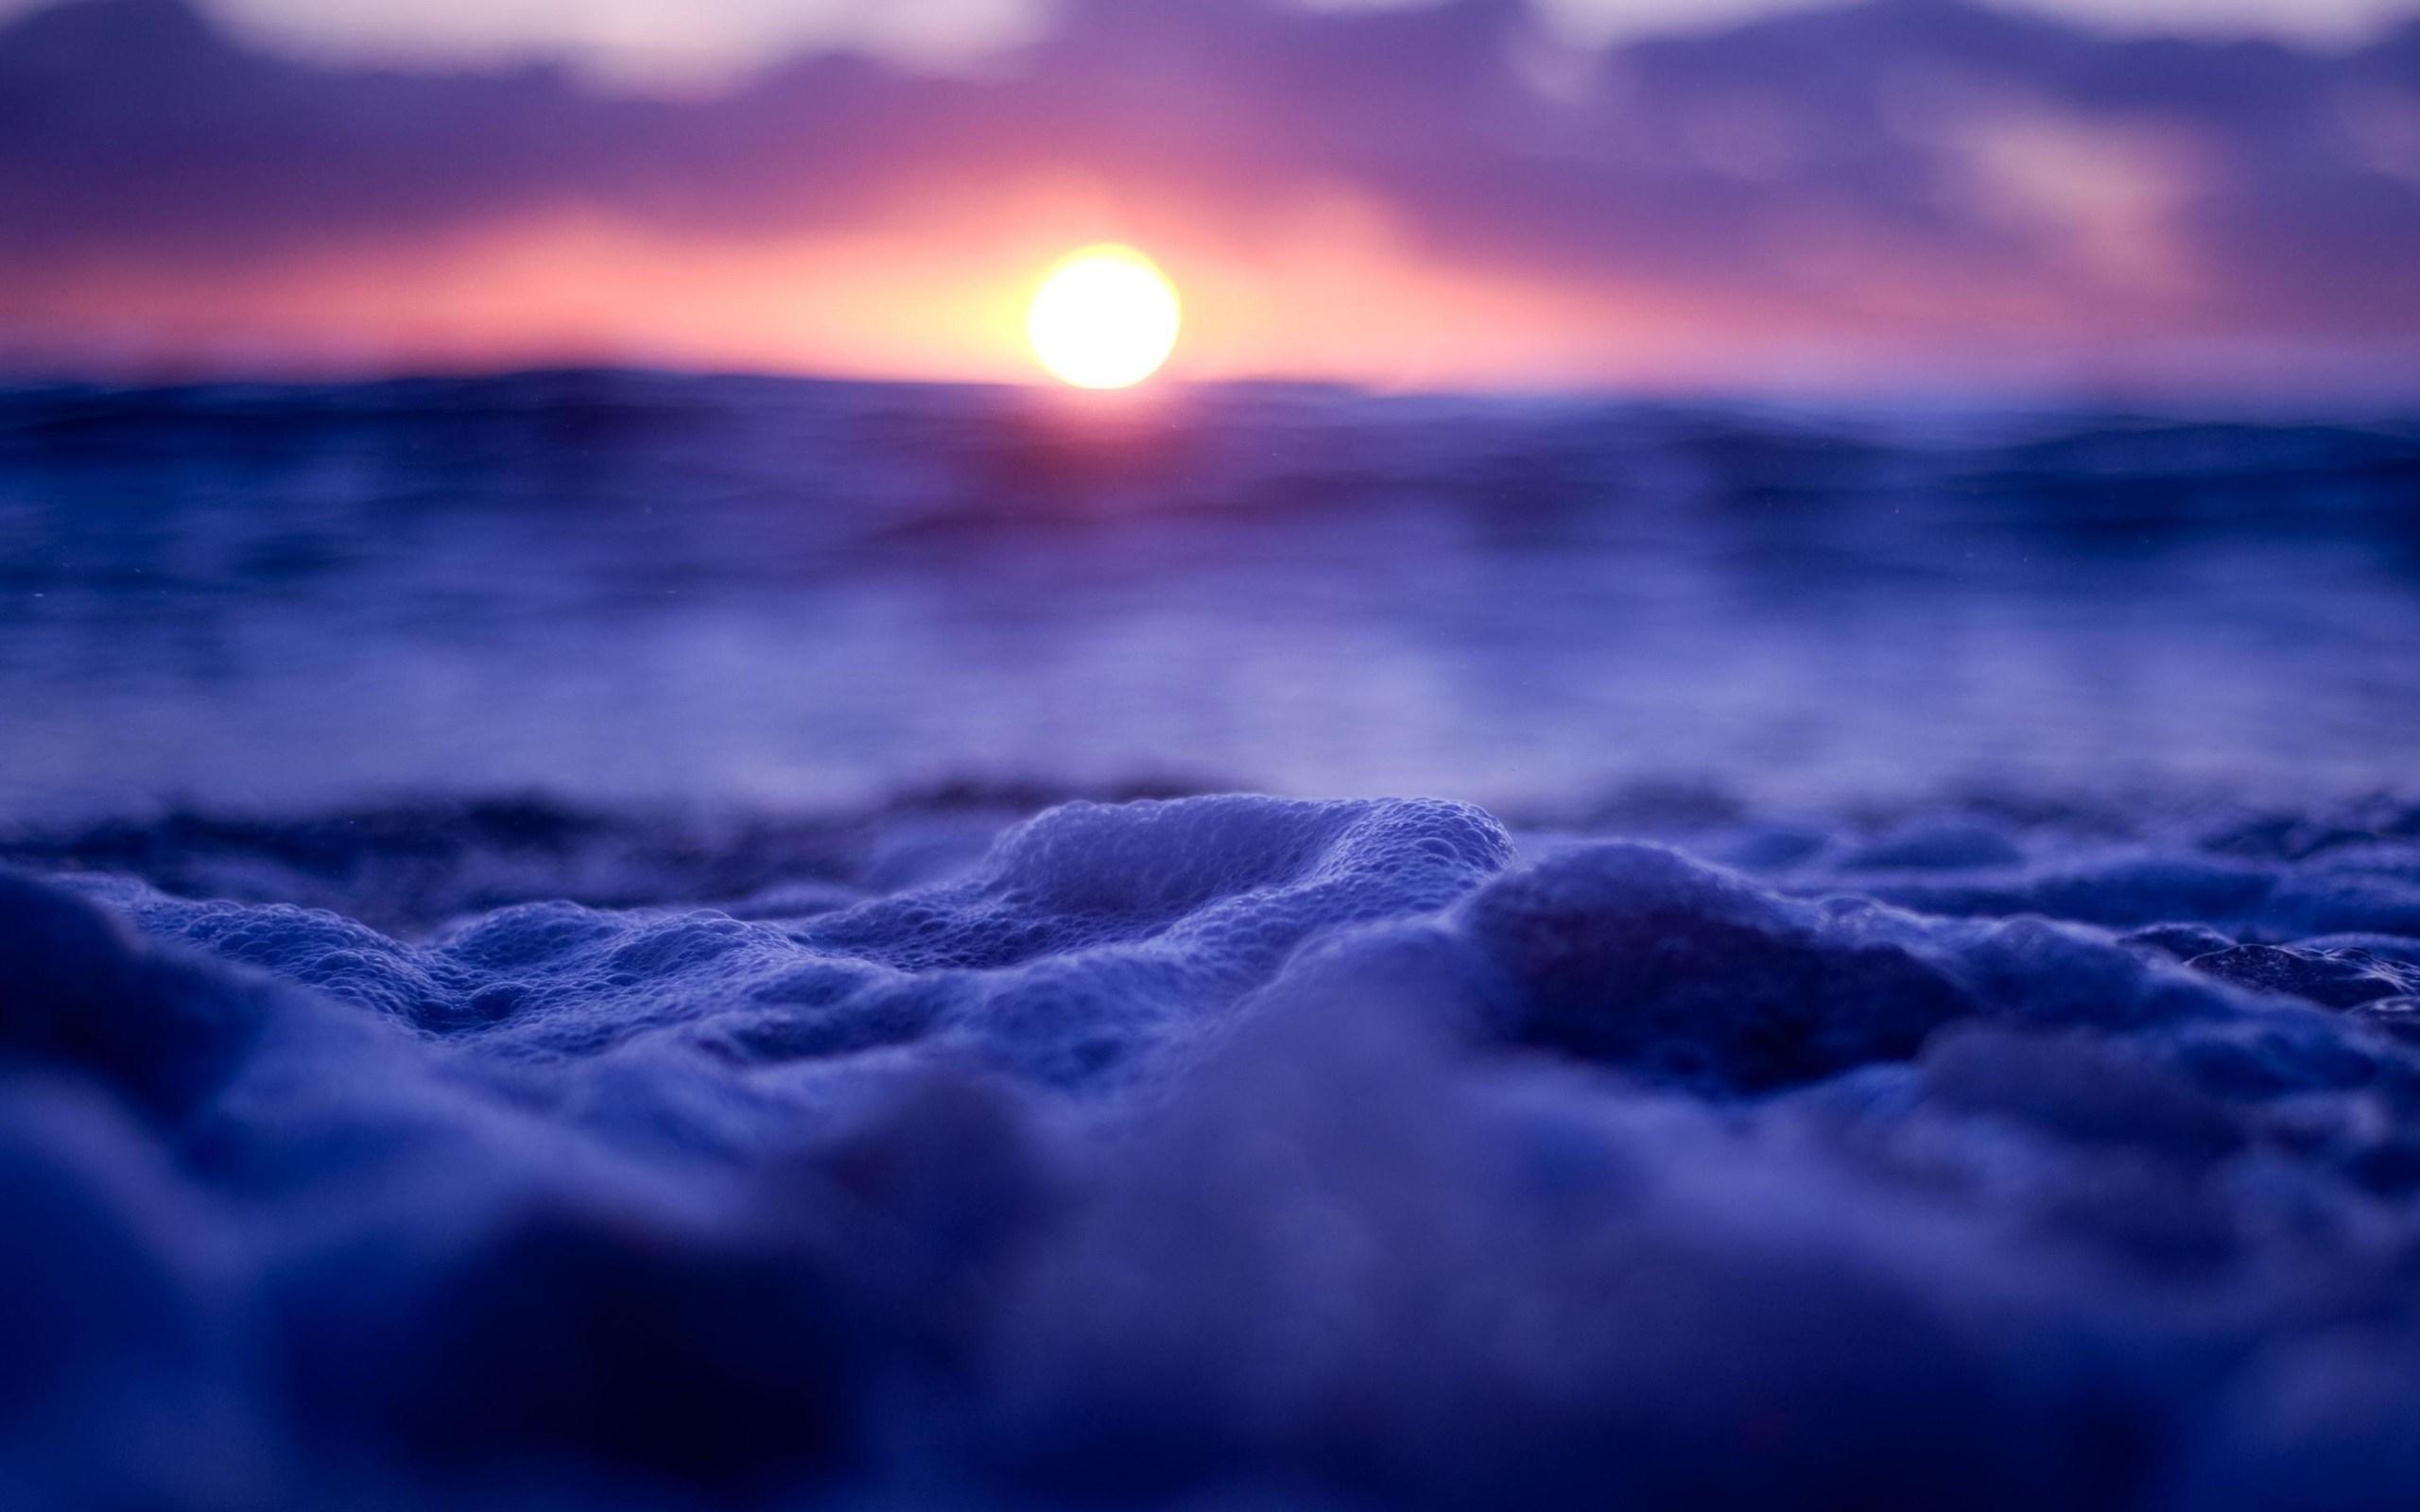 sea hd photo